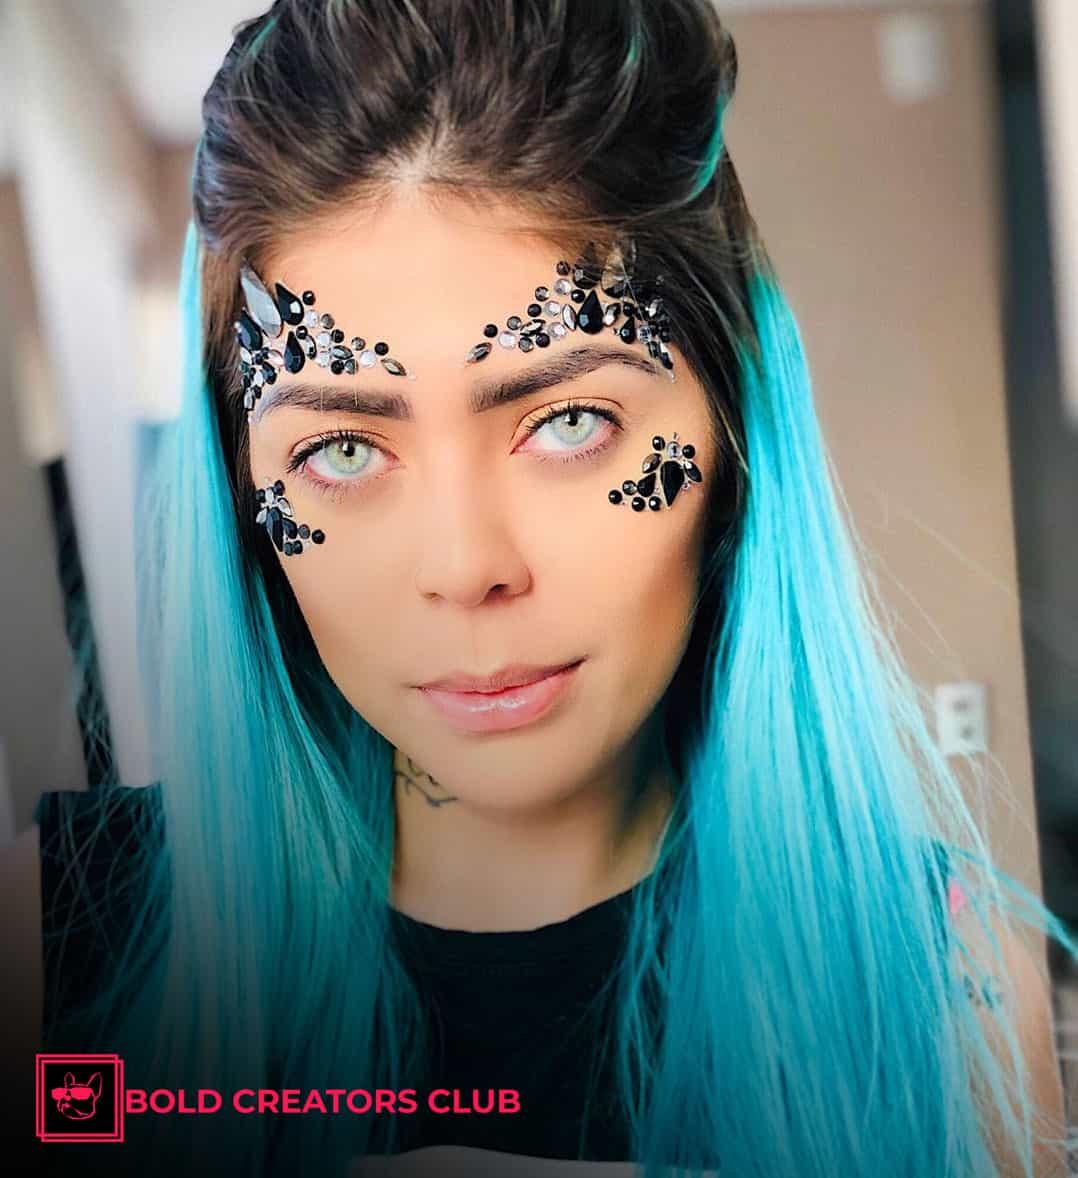 MC Bella Bold Creators Club Influencer Marketing Agency South America Brazil